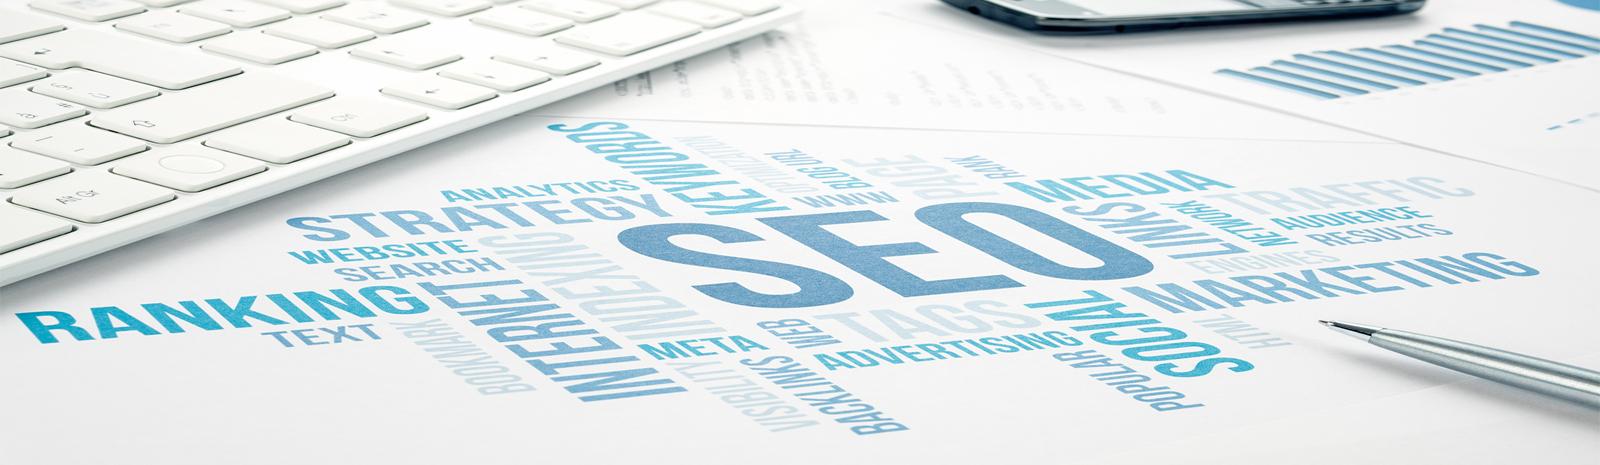 web-design-development-company-sri-lanka-blog-search-engine-optimization